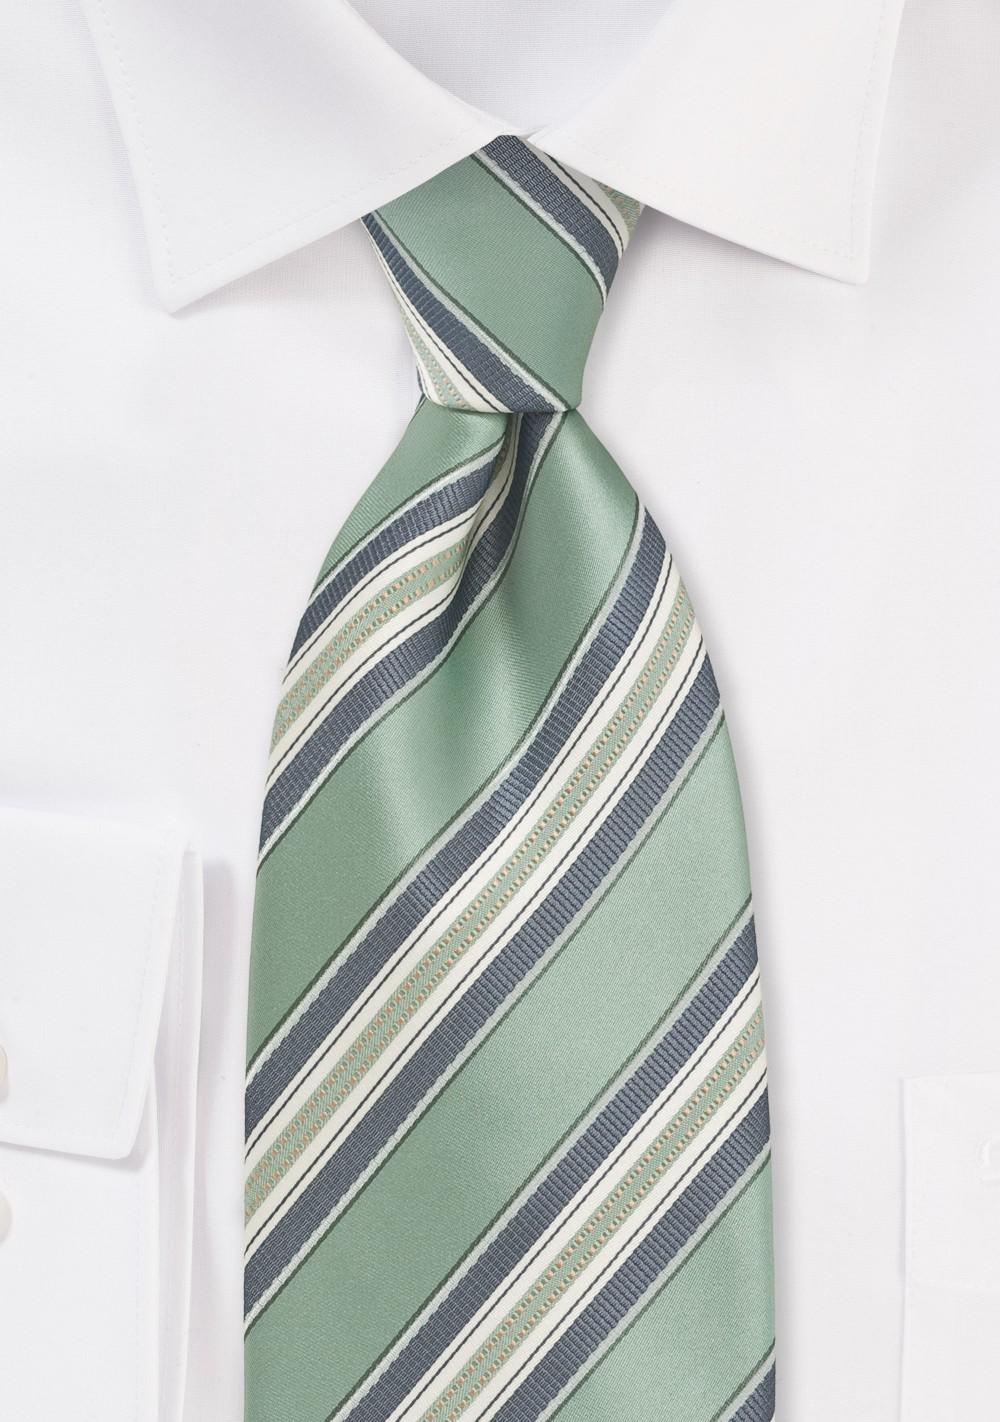 Striped Kids Tie in Clover Green